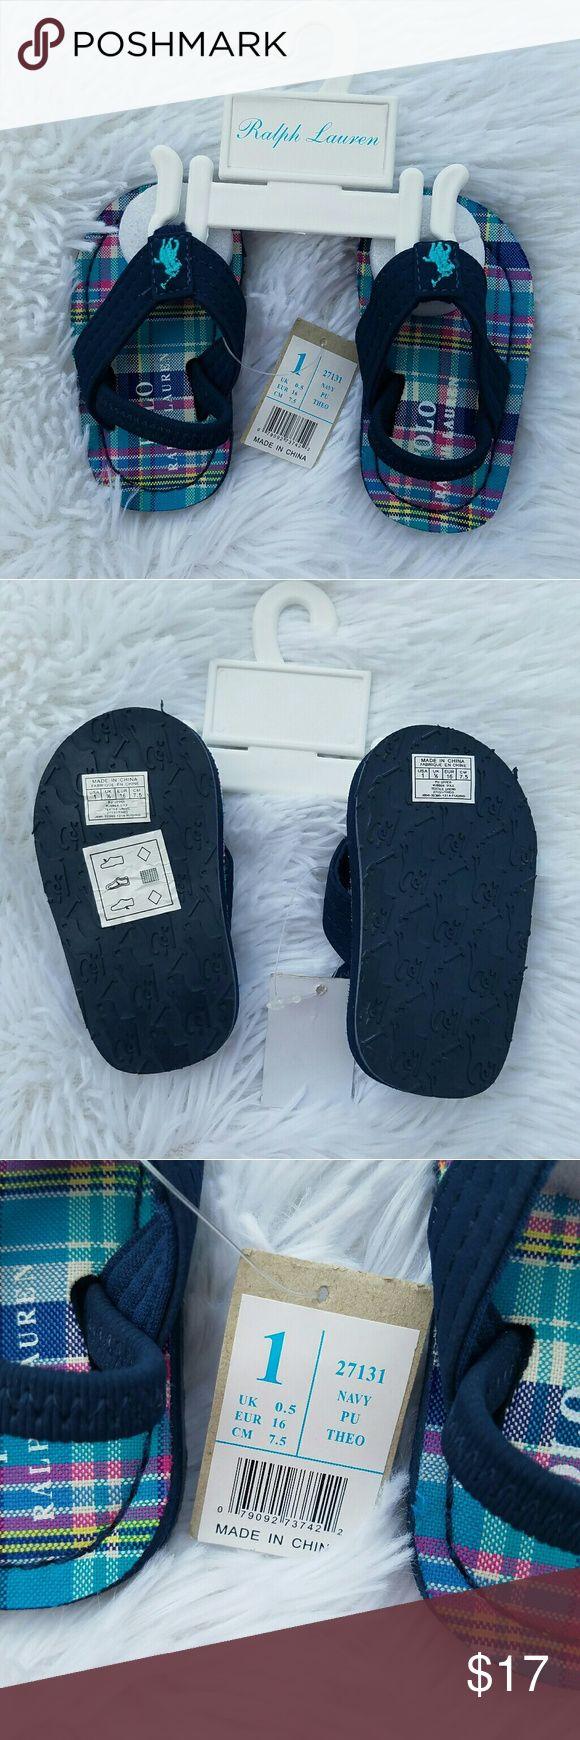 NWT. Polo Ralph Lauren Baby Boy Sandals NWT. Polo Ralph Lauren Baby Boy Sandals. Size 1. Polo by Ralph Lauren Shoes Sandals & Flip Flops